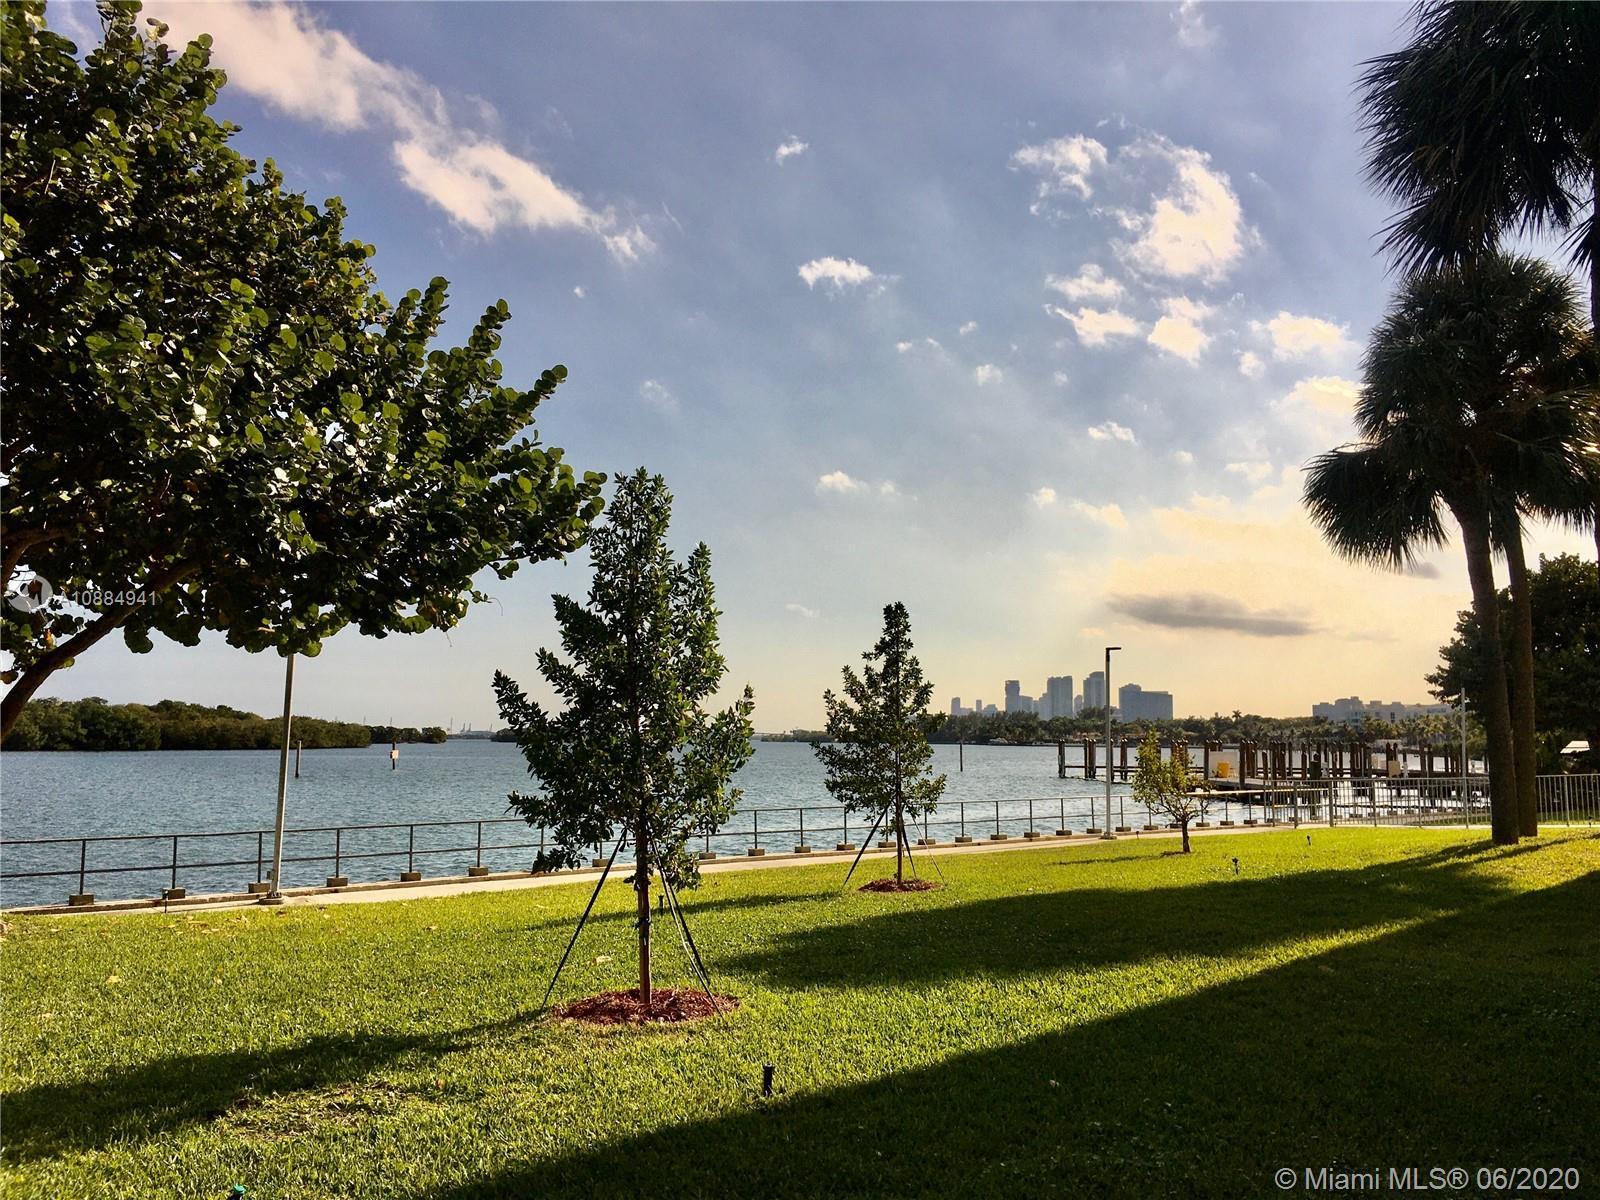 880 NE 69th St # 7H, Miami, Florida 33138, ,1 BathroomBathrooms,Residential,For Sale,880 NE 69th St # 7H,A10884941